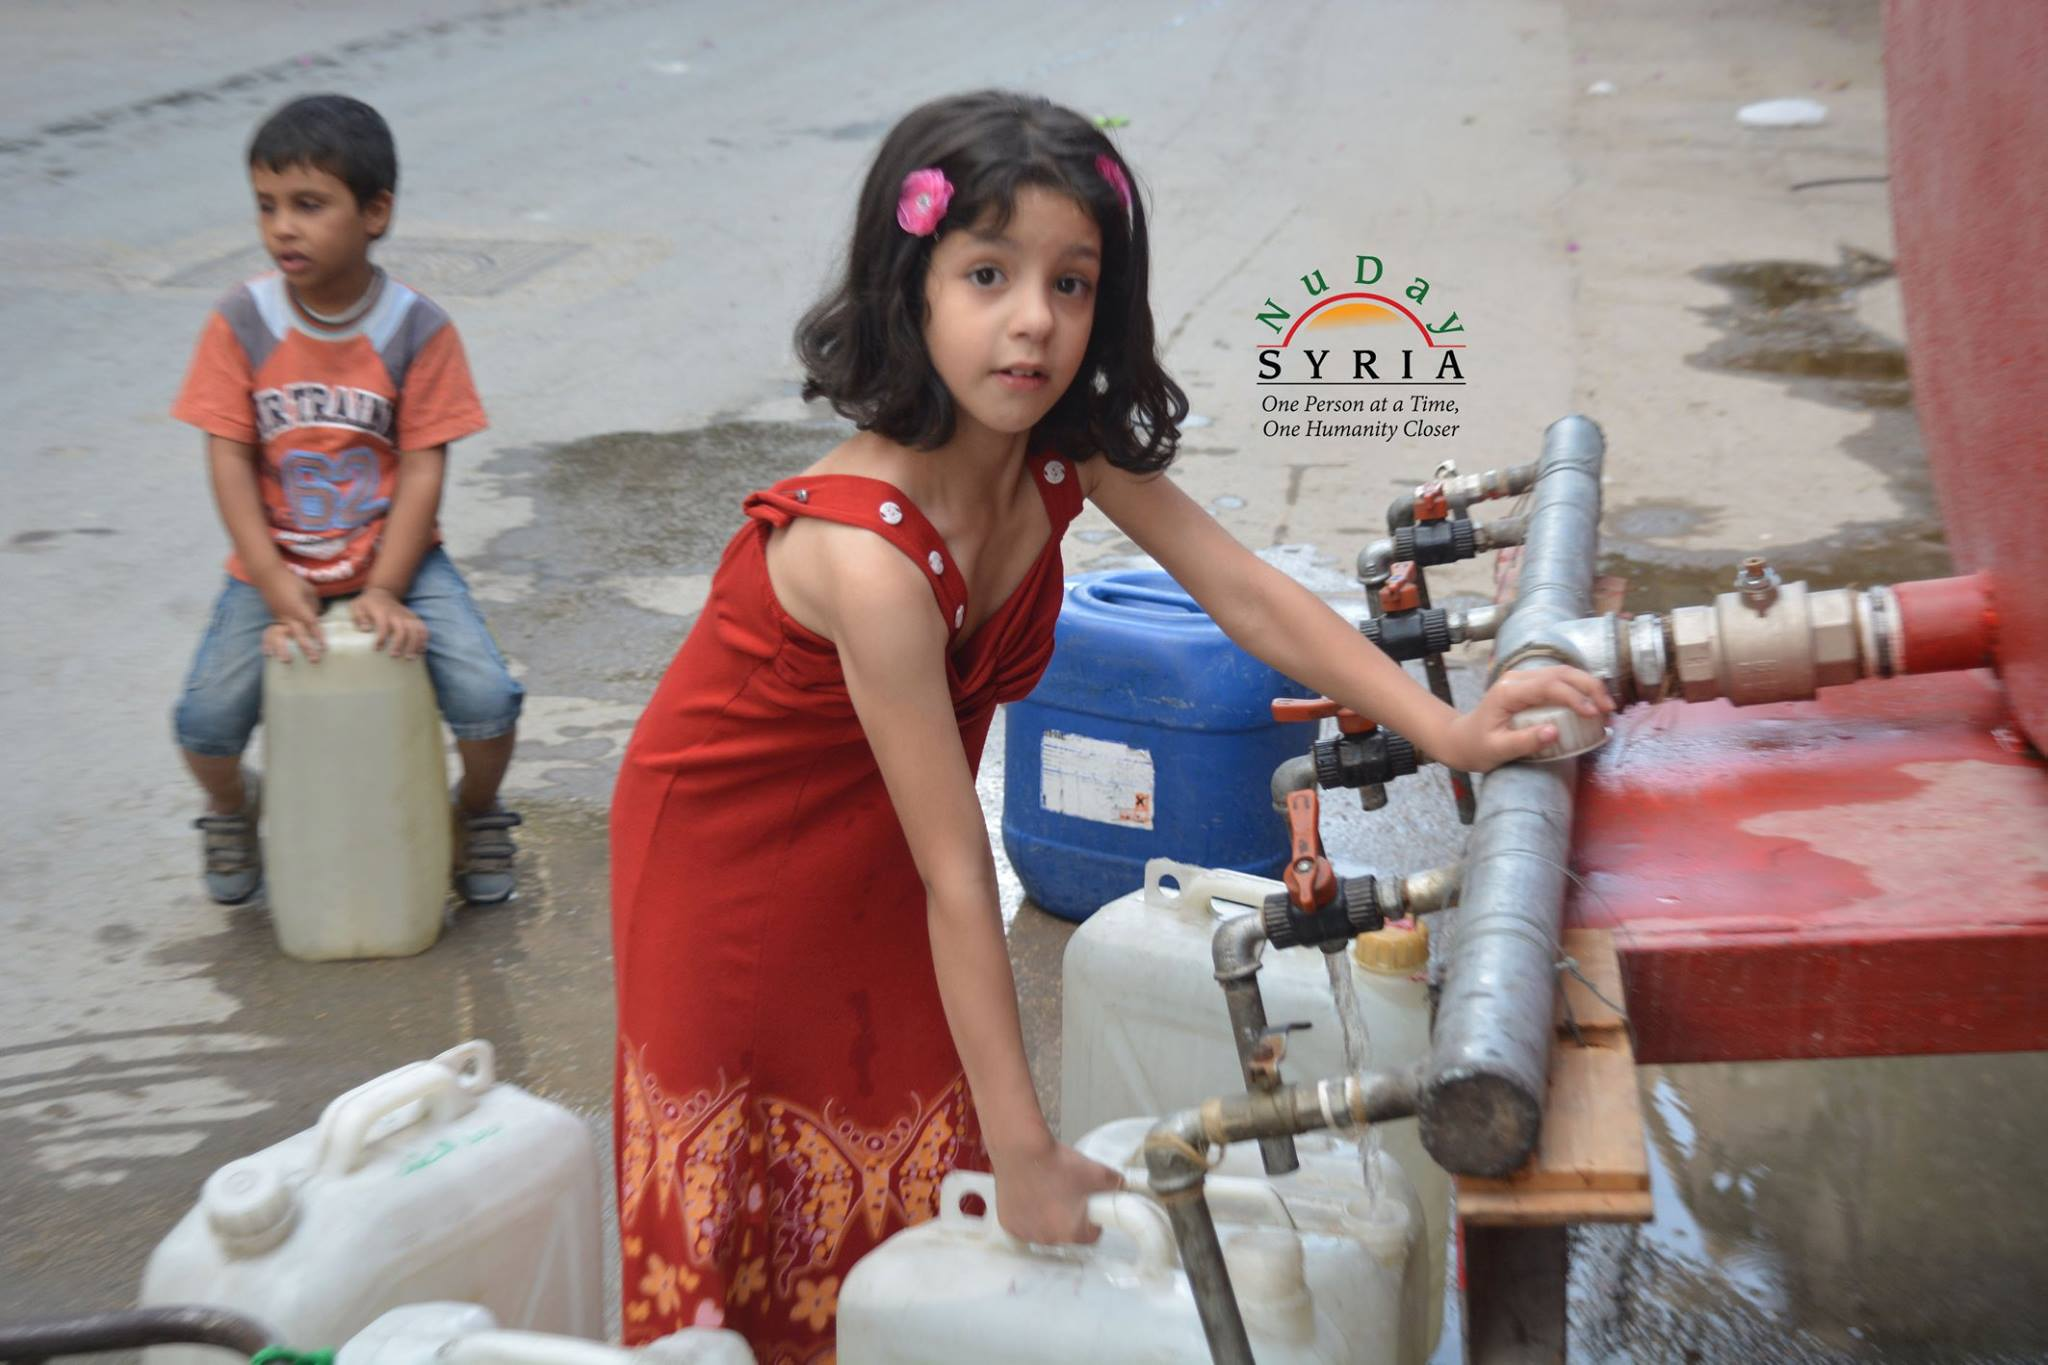 Syria's saving will be through its women